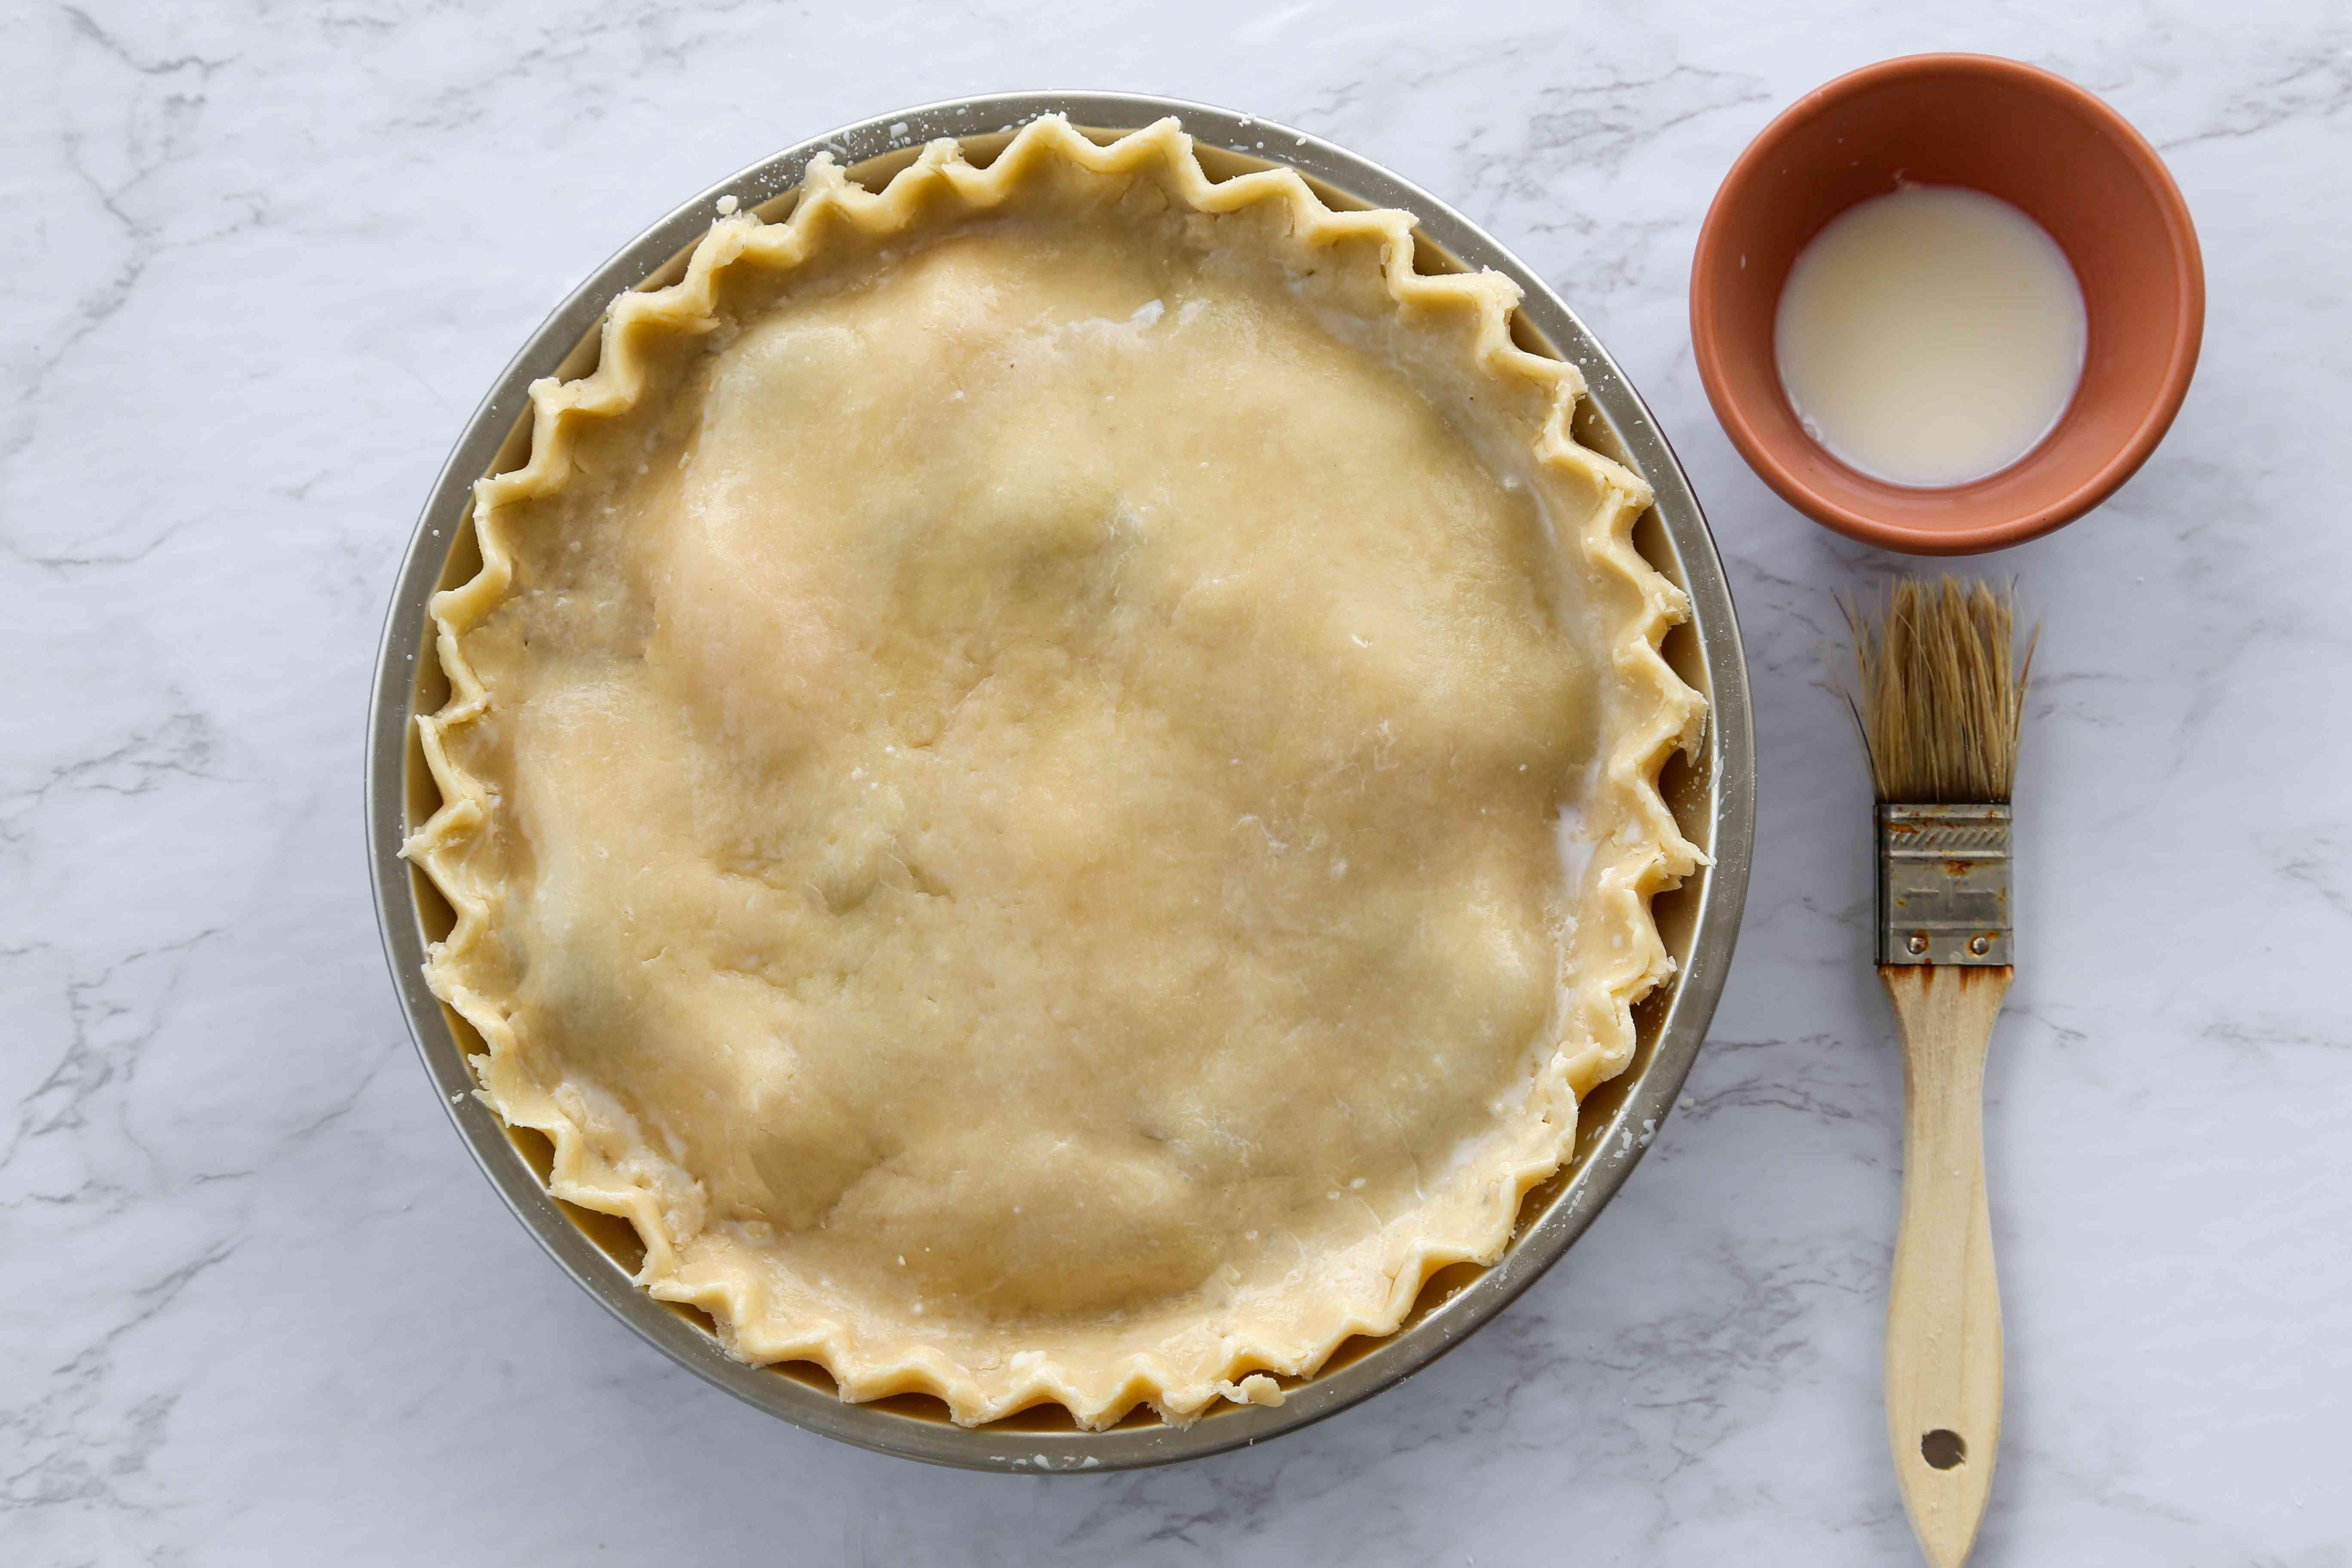 Brush the pie top with milk